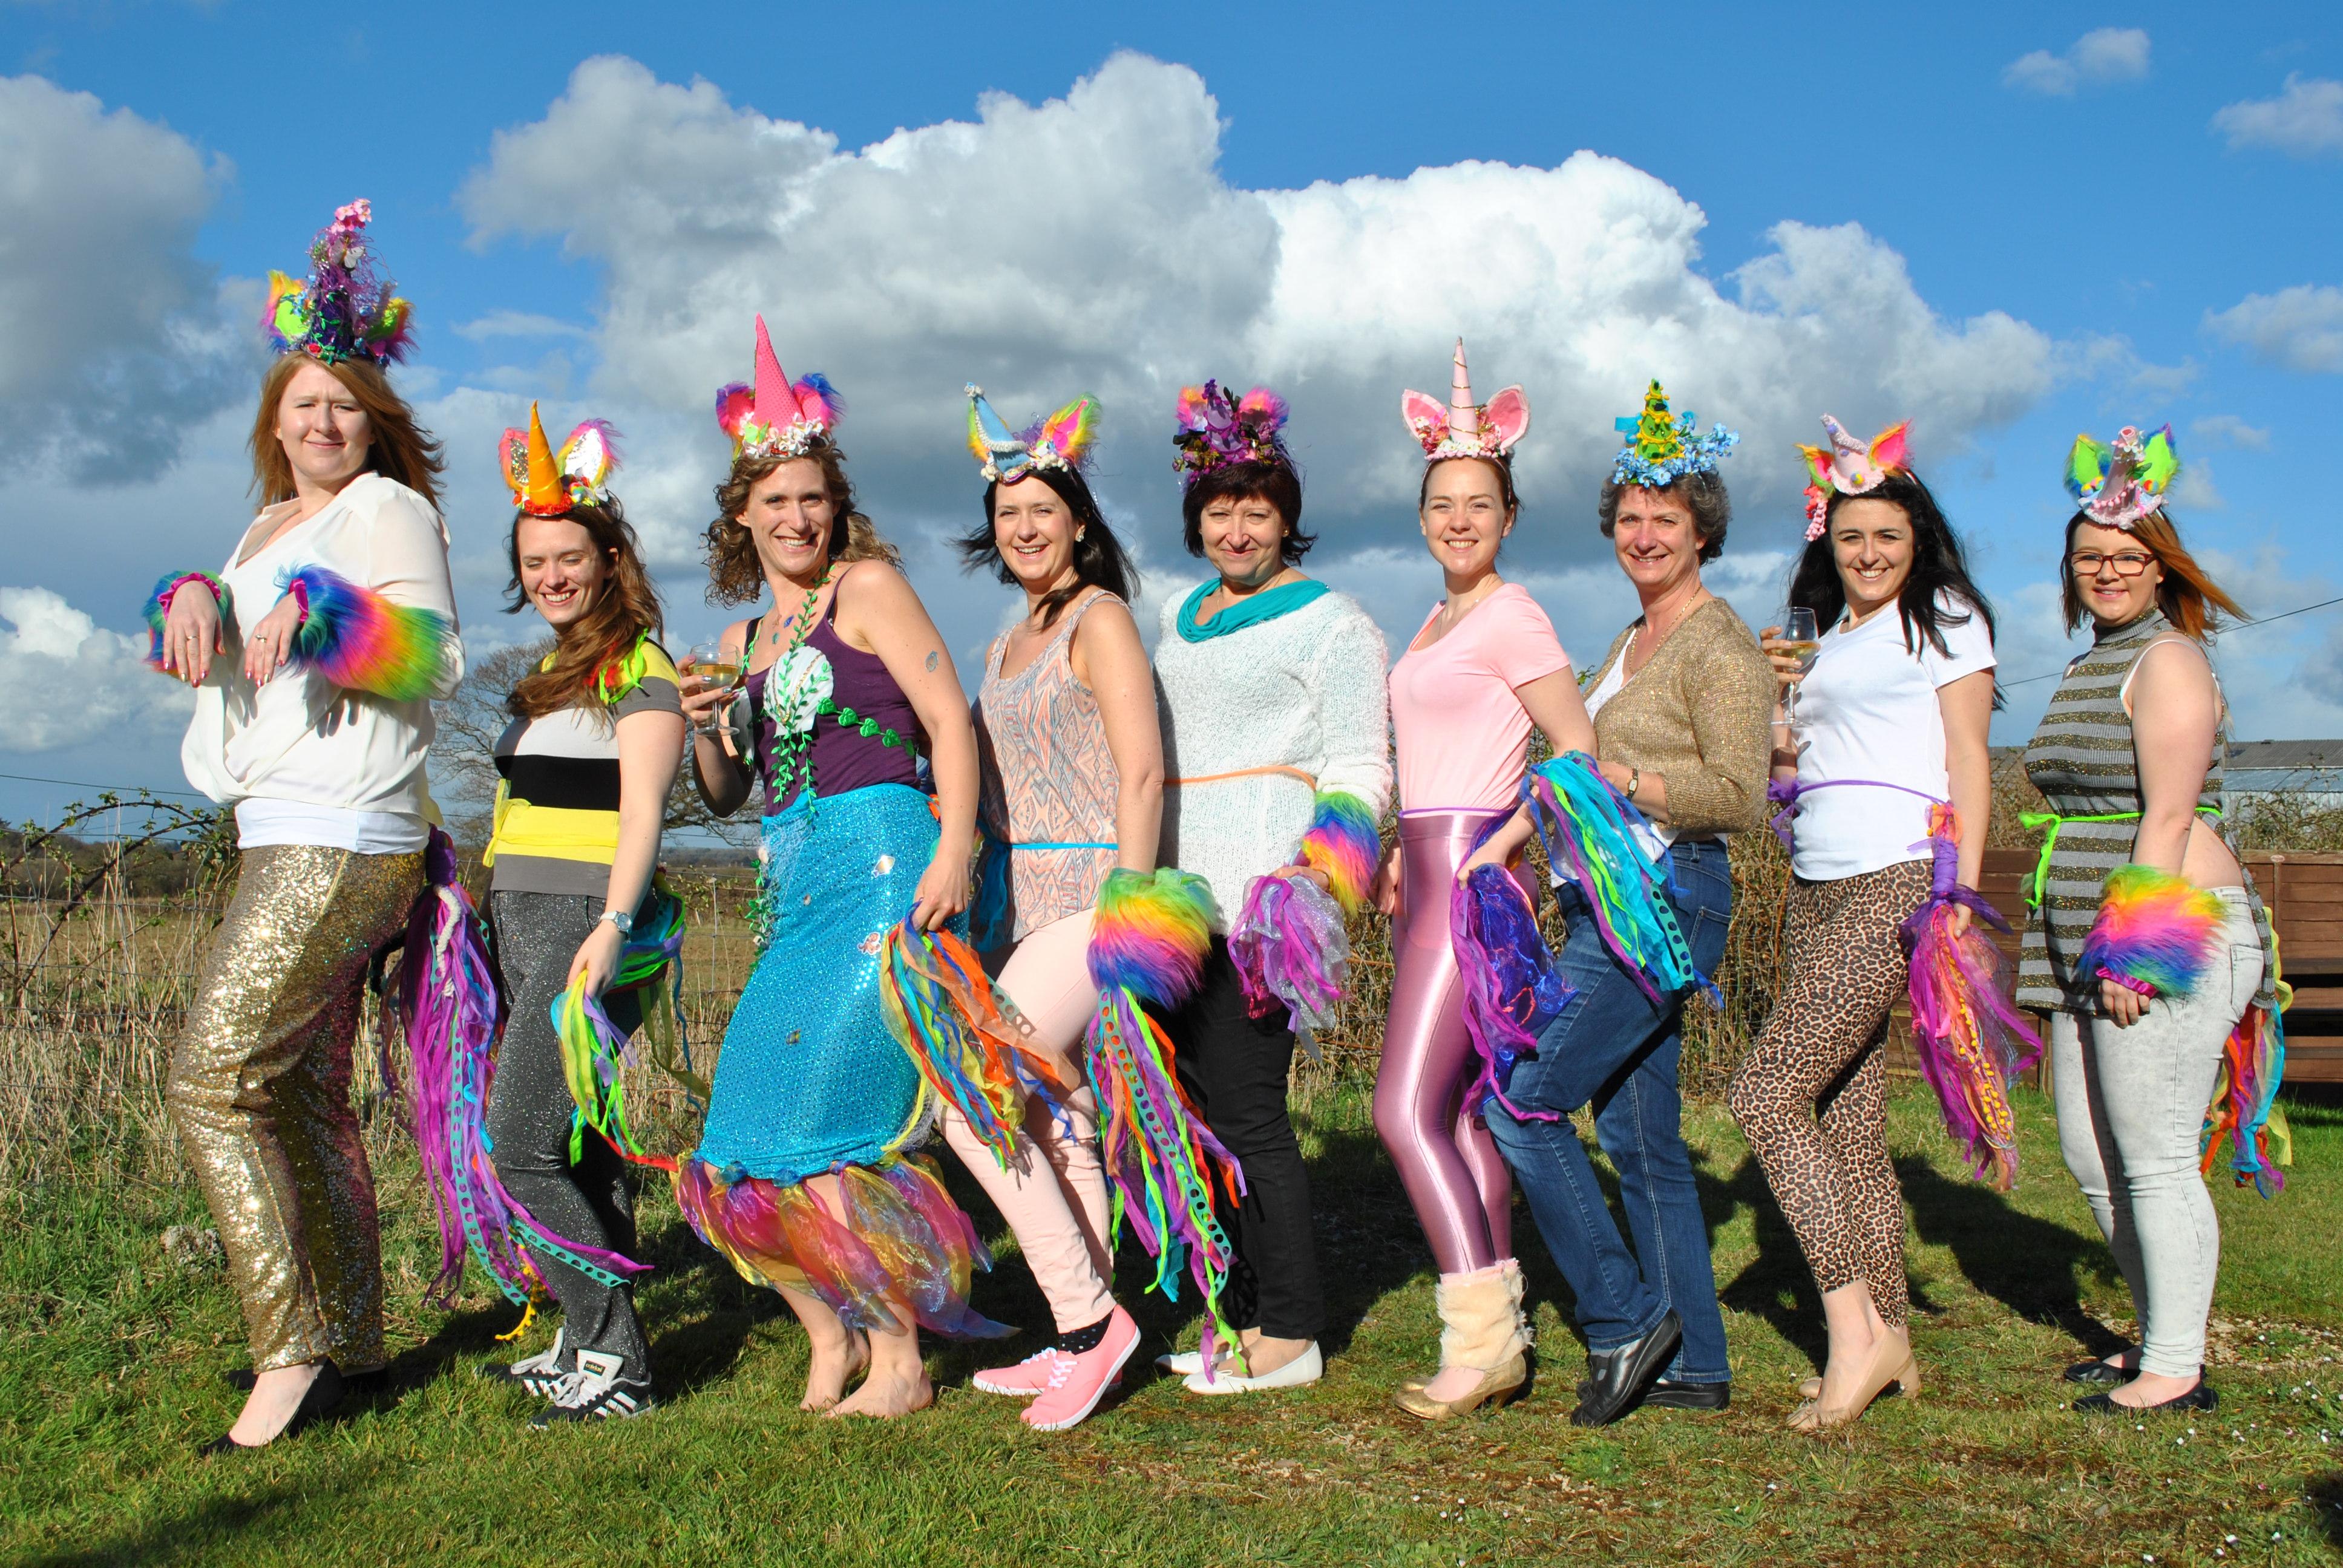 Unicorns Vs Mermaids The Ultimate Alternative Hen Do Weddingplanner Co Uk